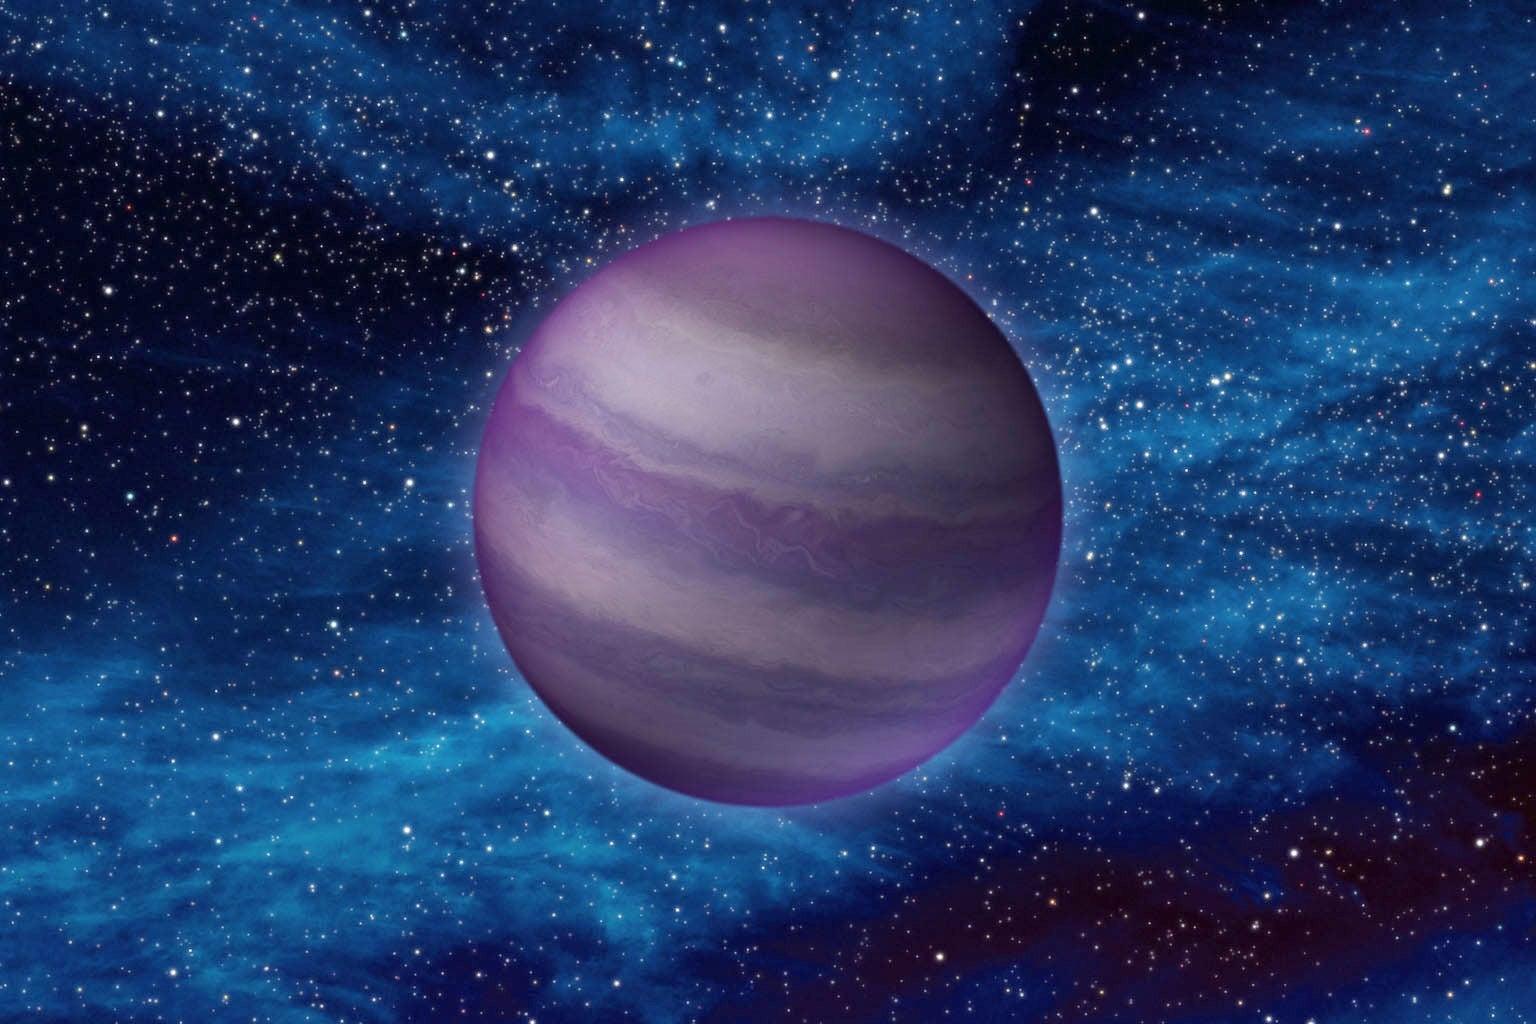 NASA artist image of brown dwarf